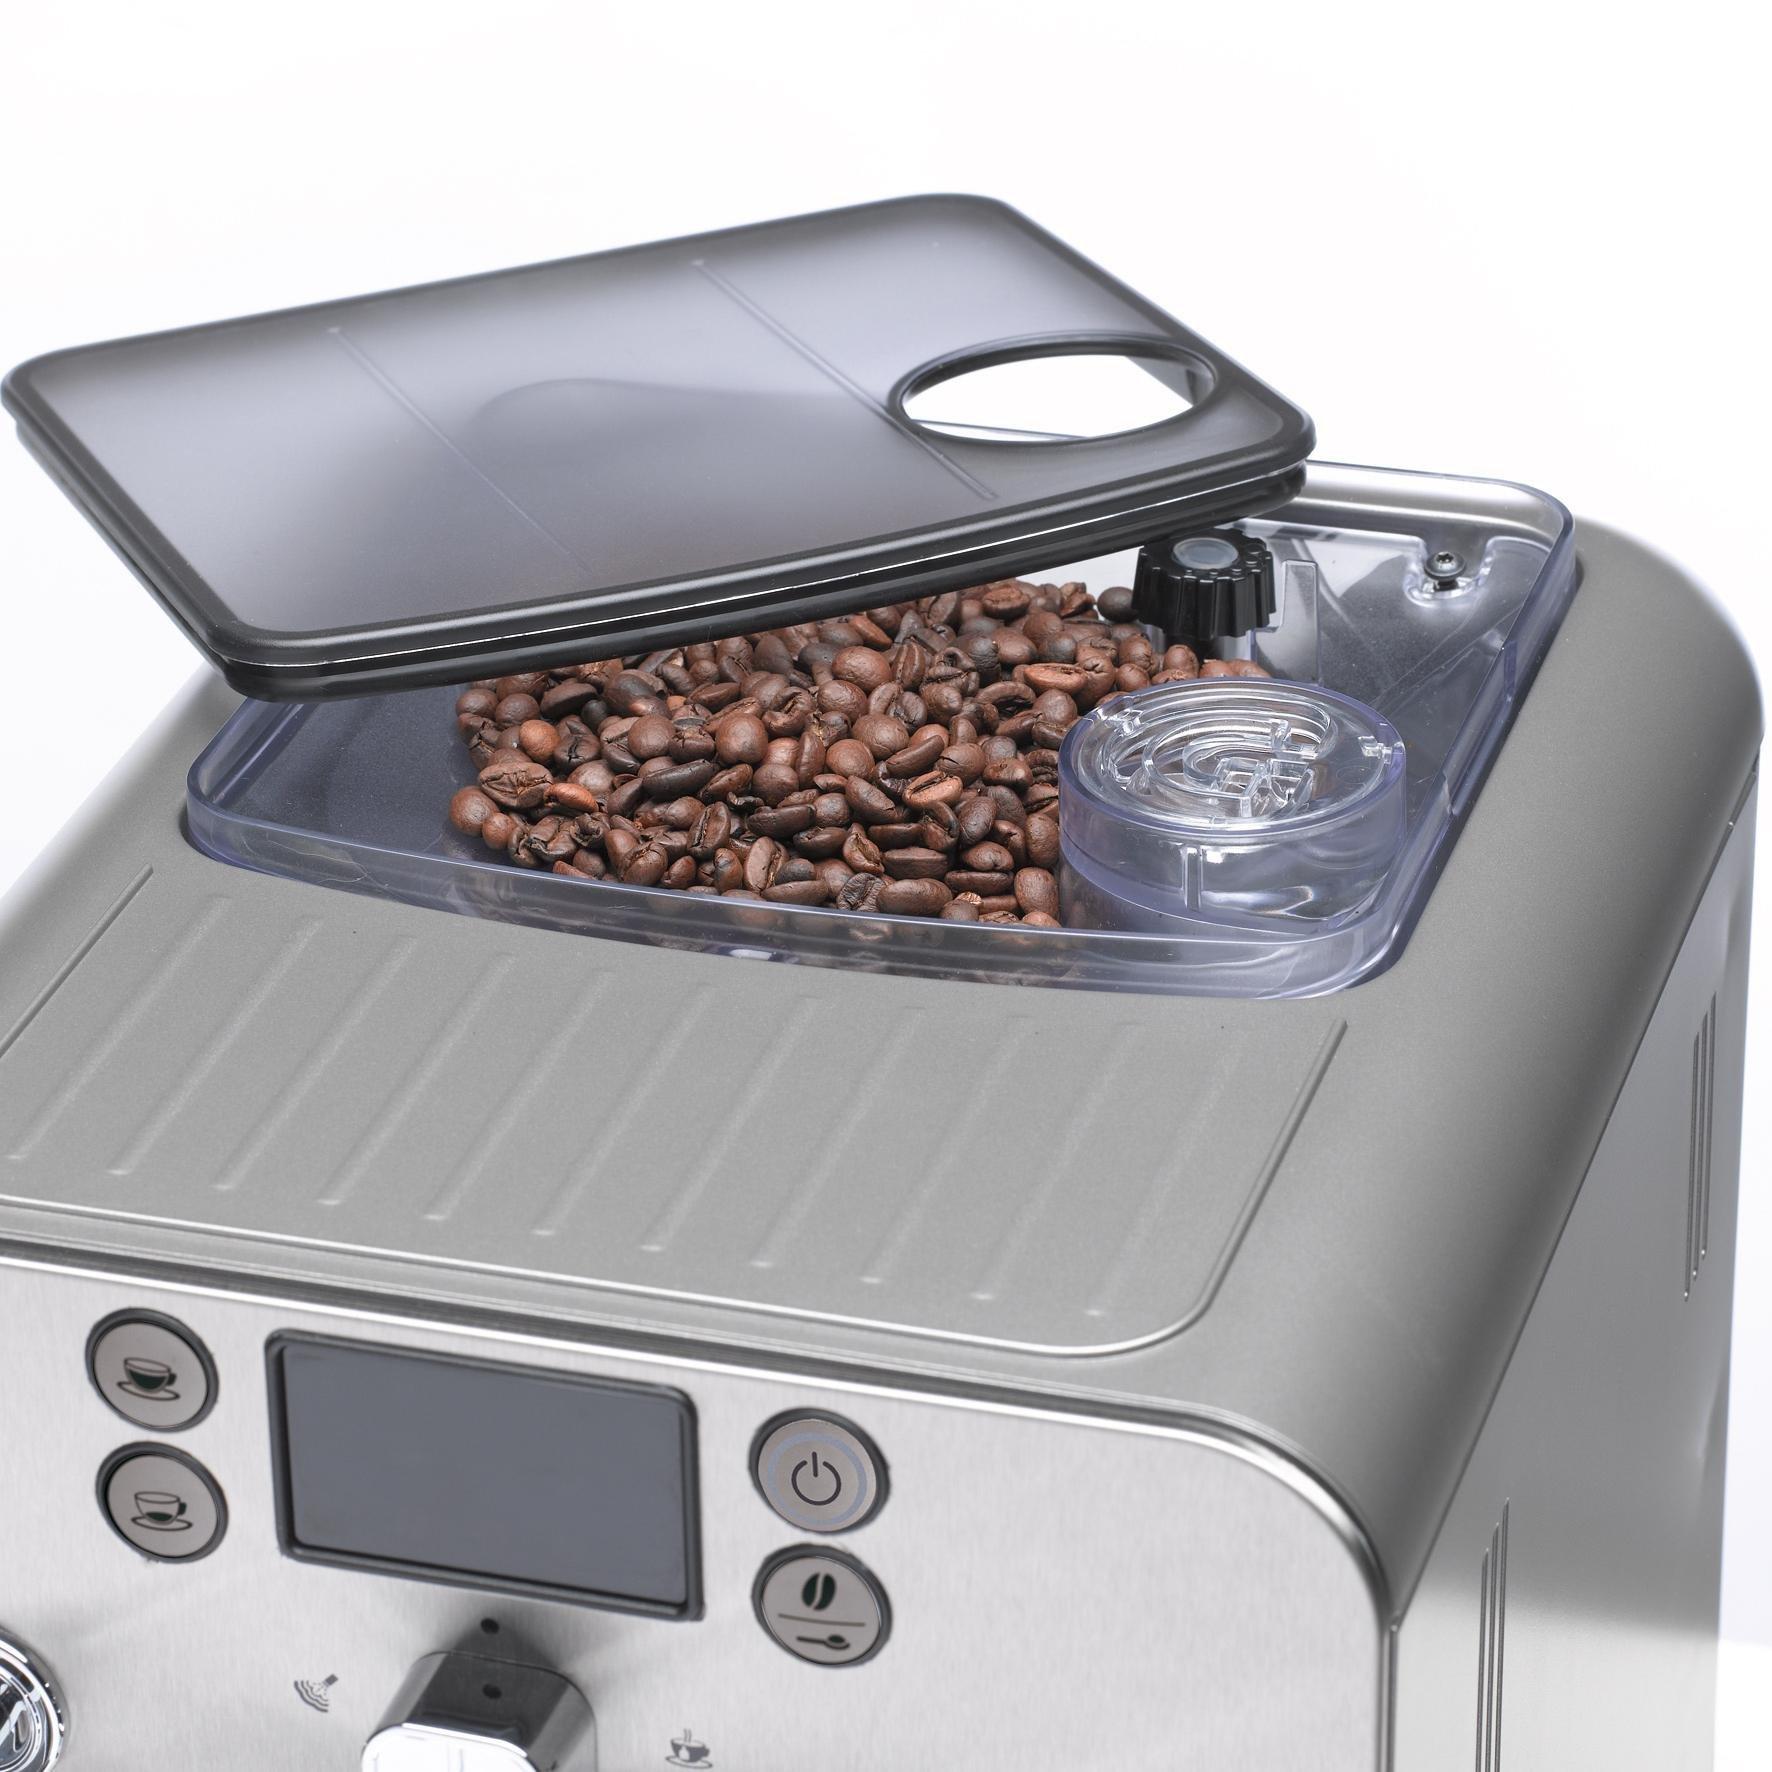 Gaggia Brera Super Automatic Espresso Machine in Silver. Pannarello Wand Frothing for Latte and Cappuccino Drinks. Espresso from Pre-Ground or Whole Bean Coffee. by Gaggia (Image #2)